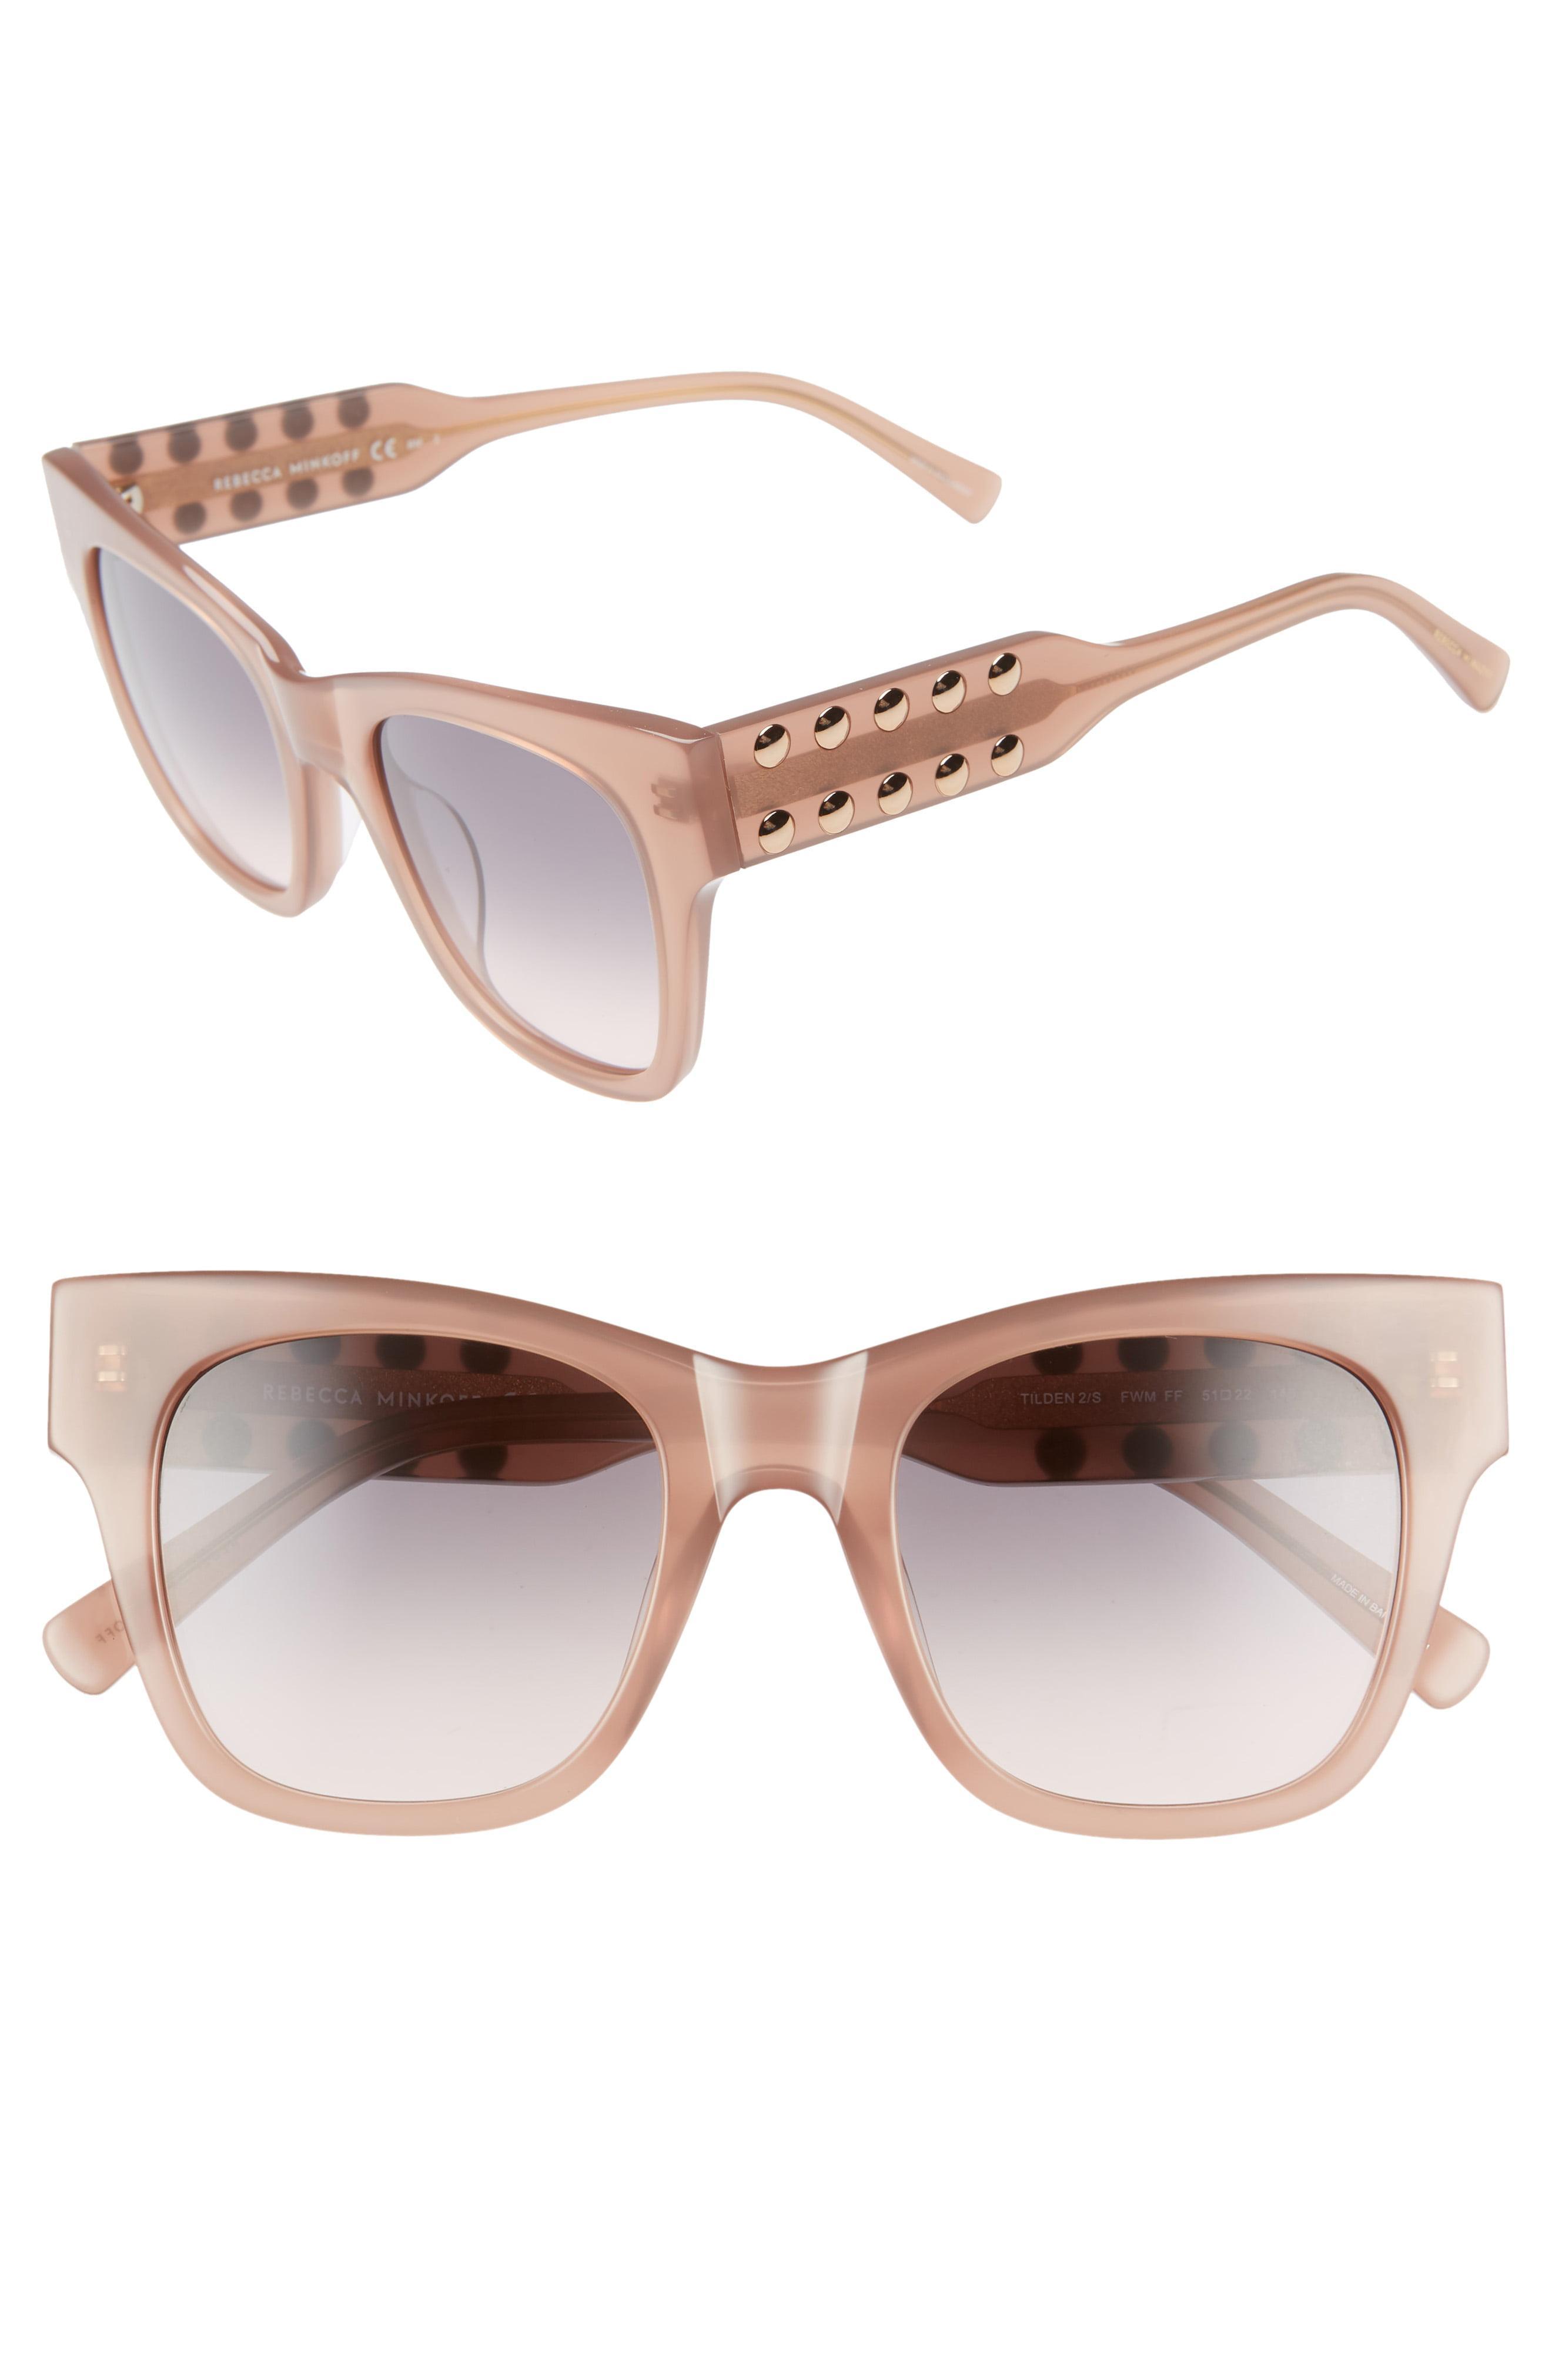 Chanel - Square Plastic CC Logo Sunglasses Nude | Luxury Bags